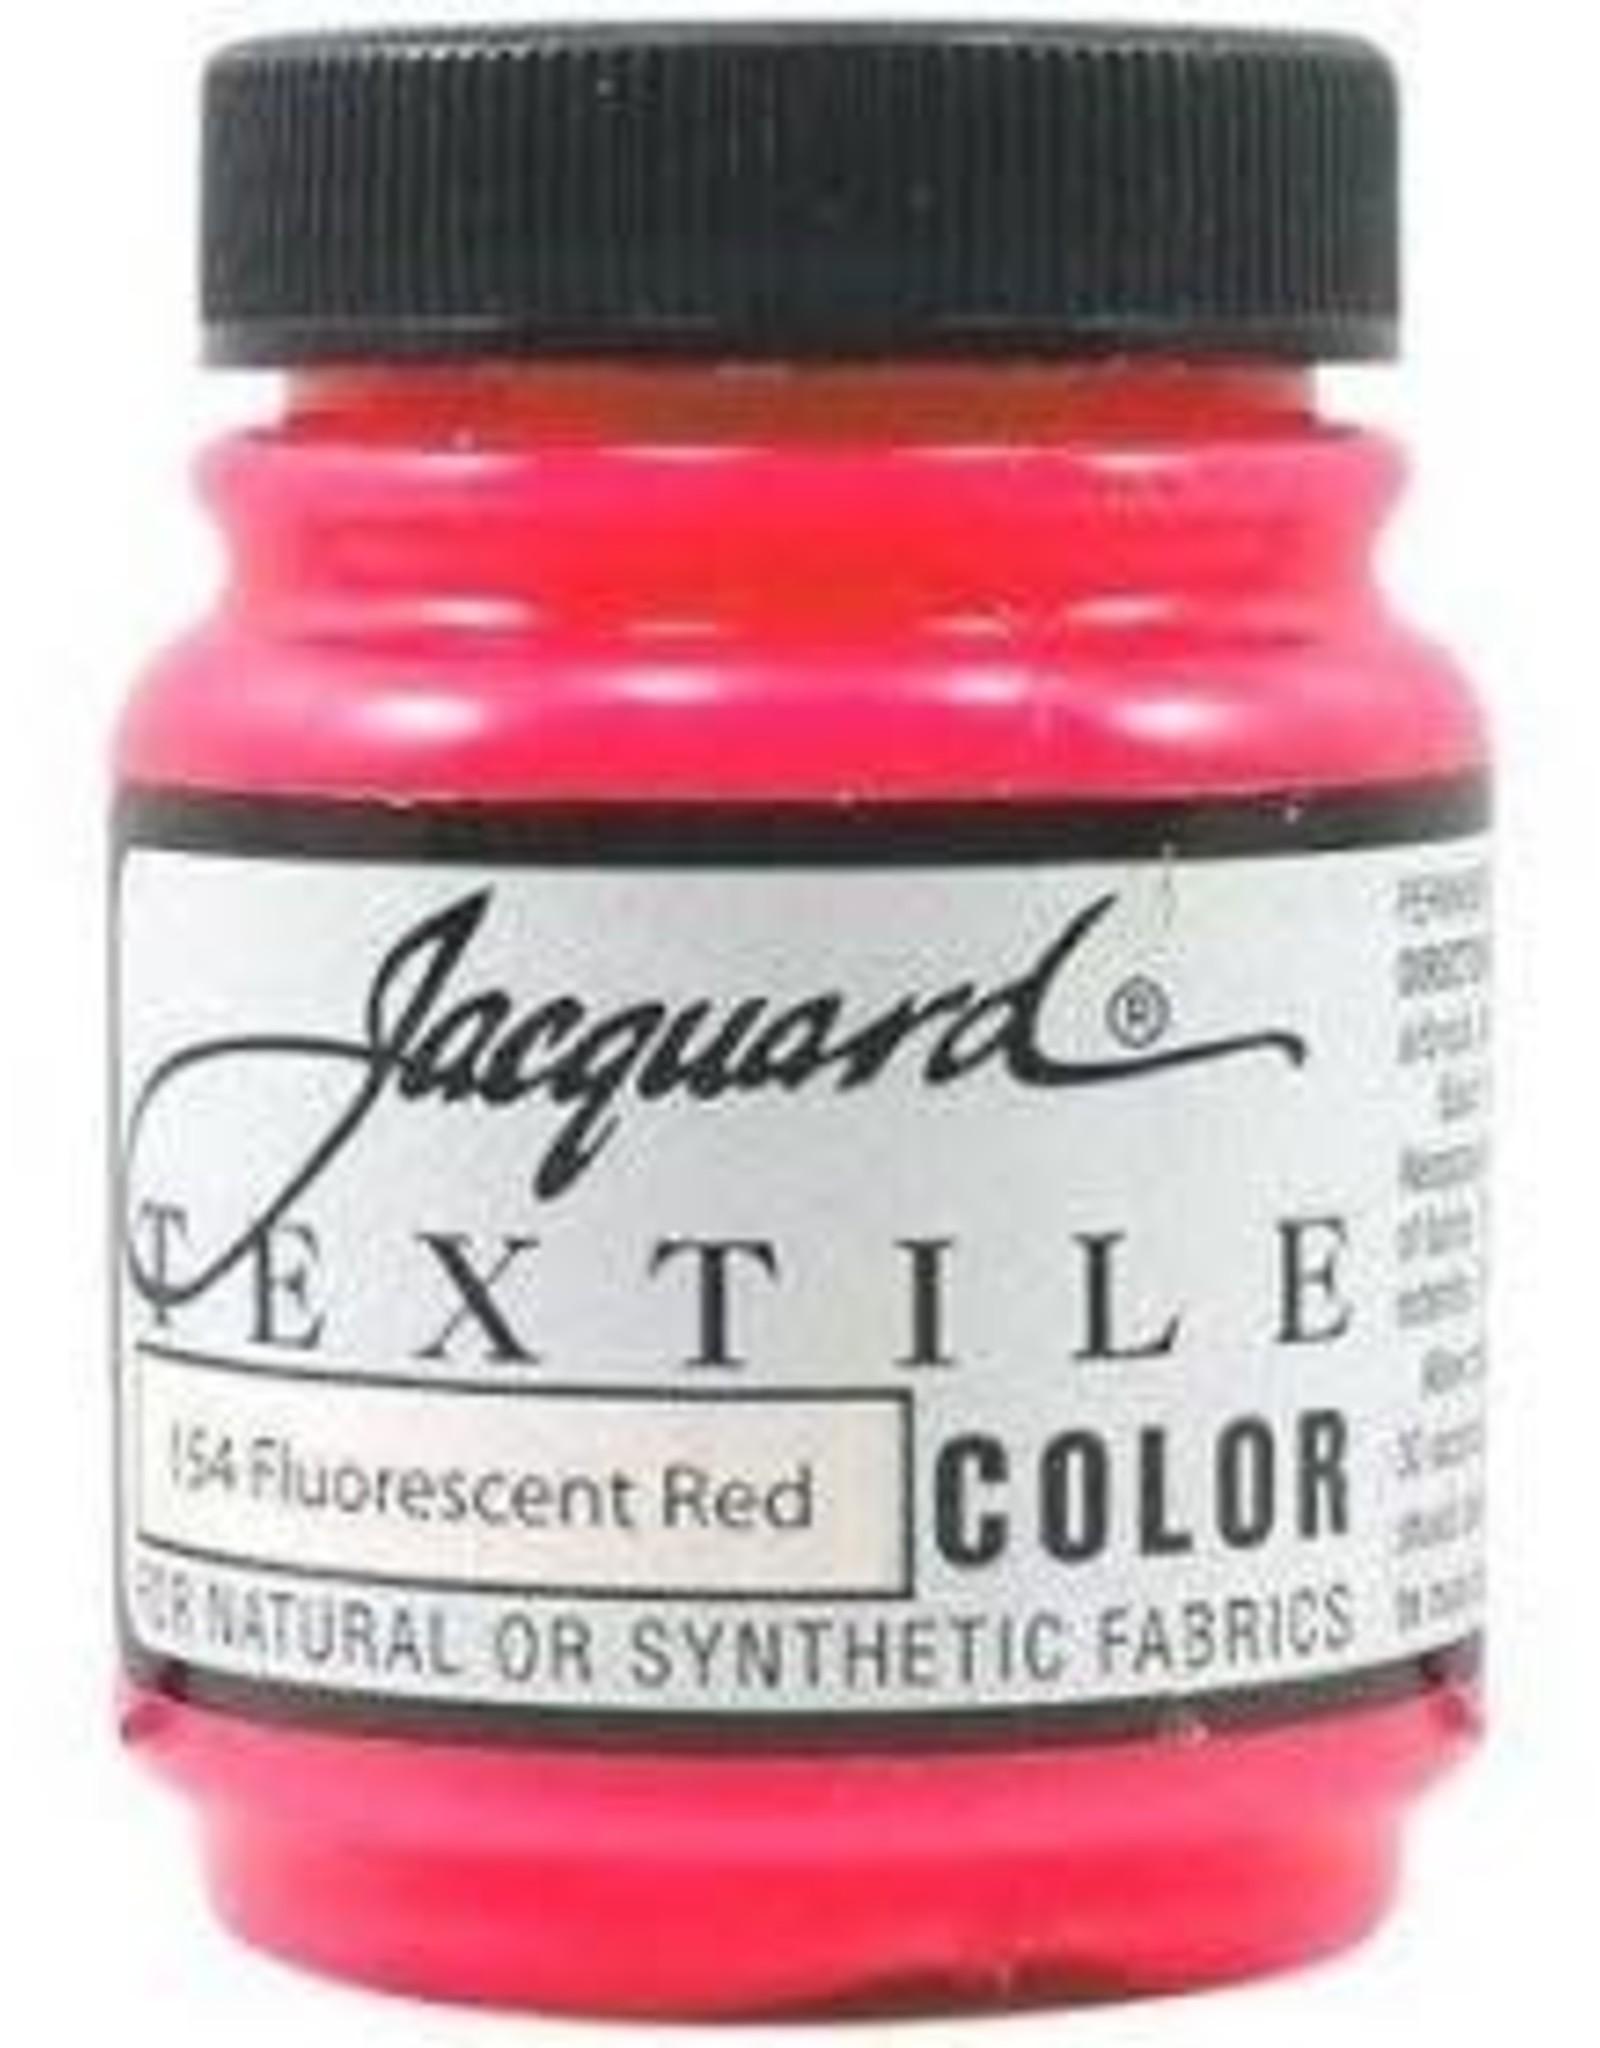 Jacquard Textile Color Fluorescent Red